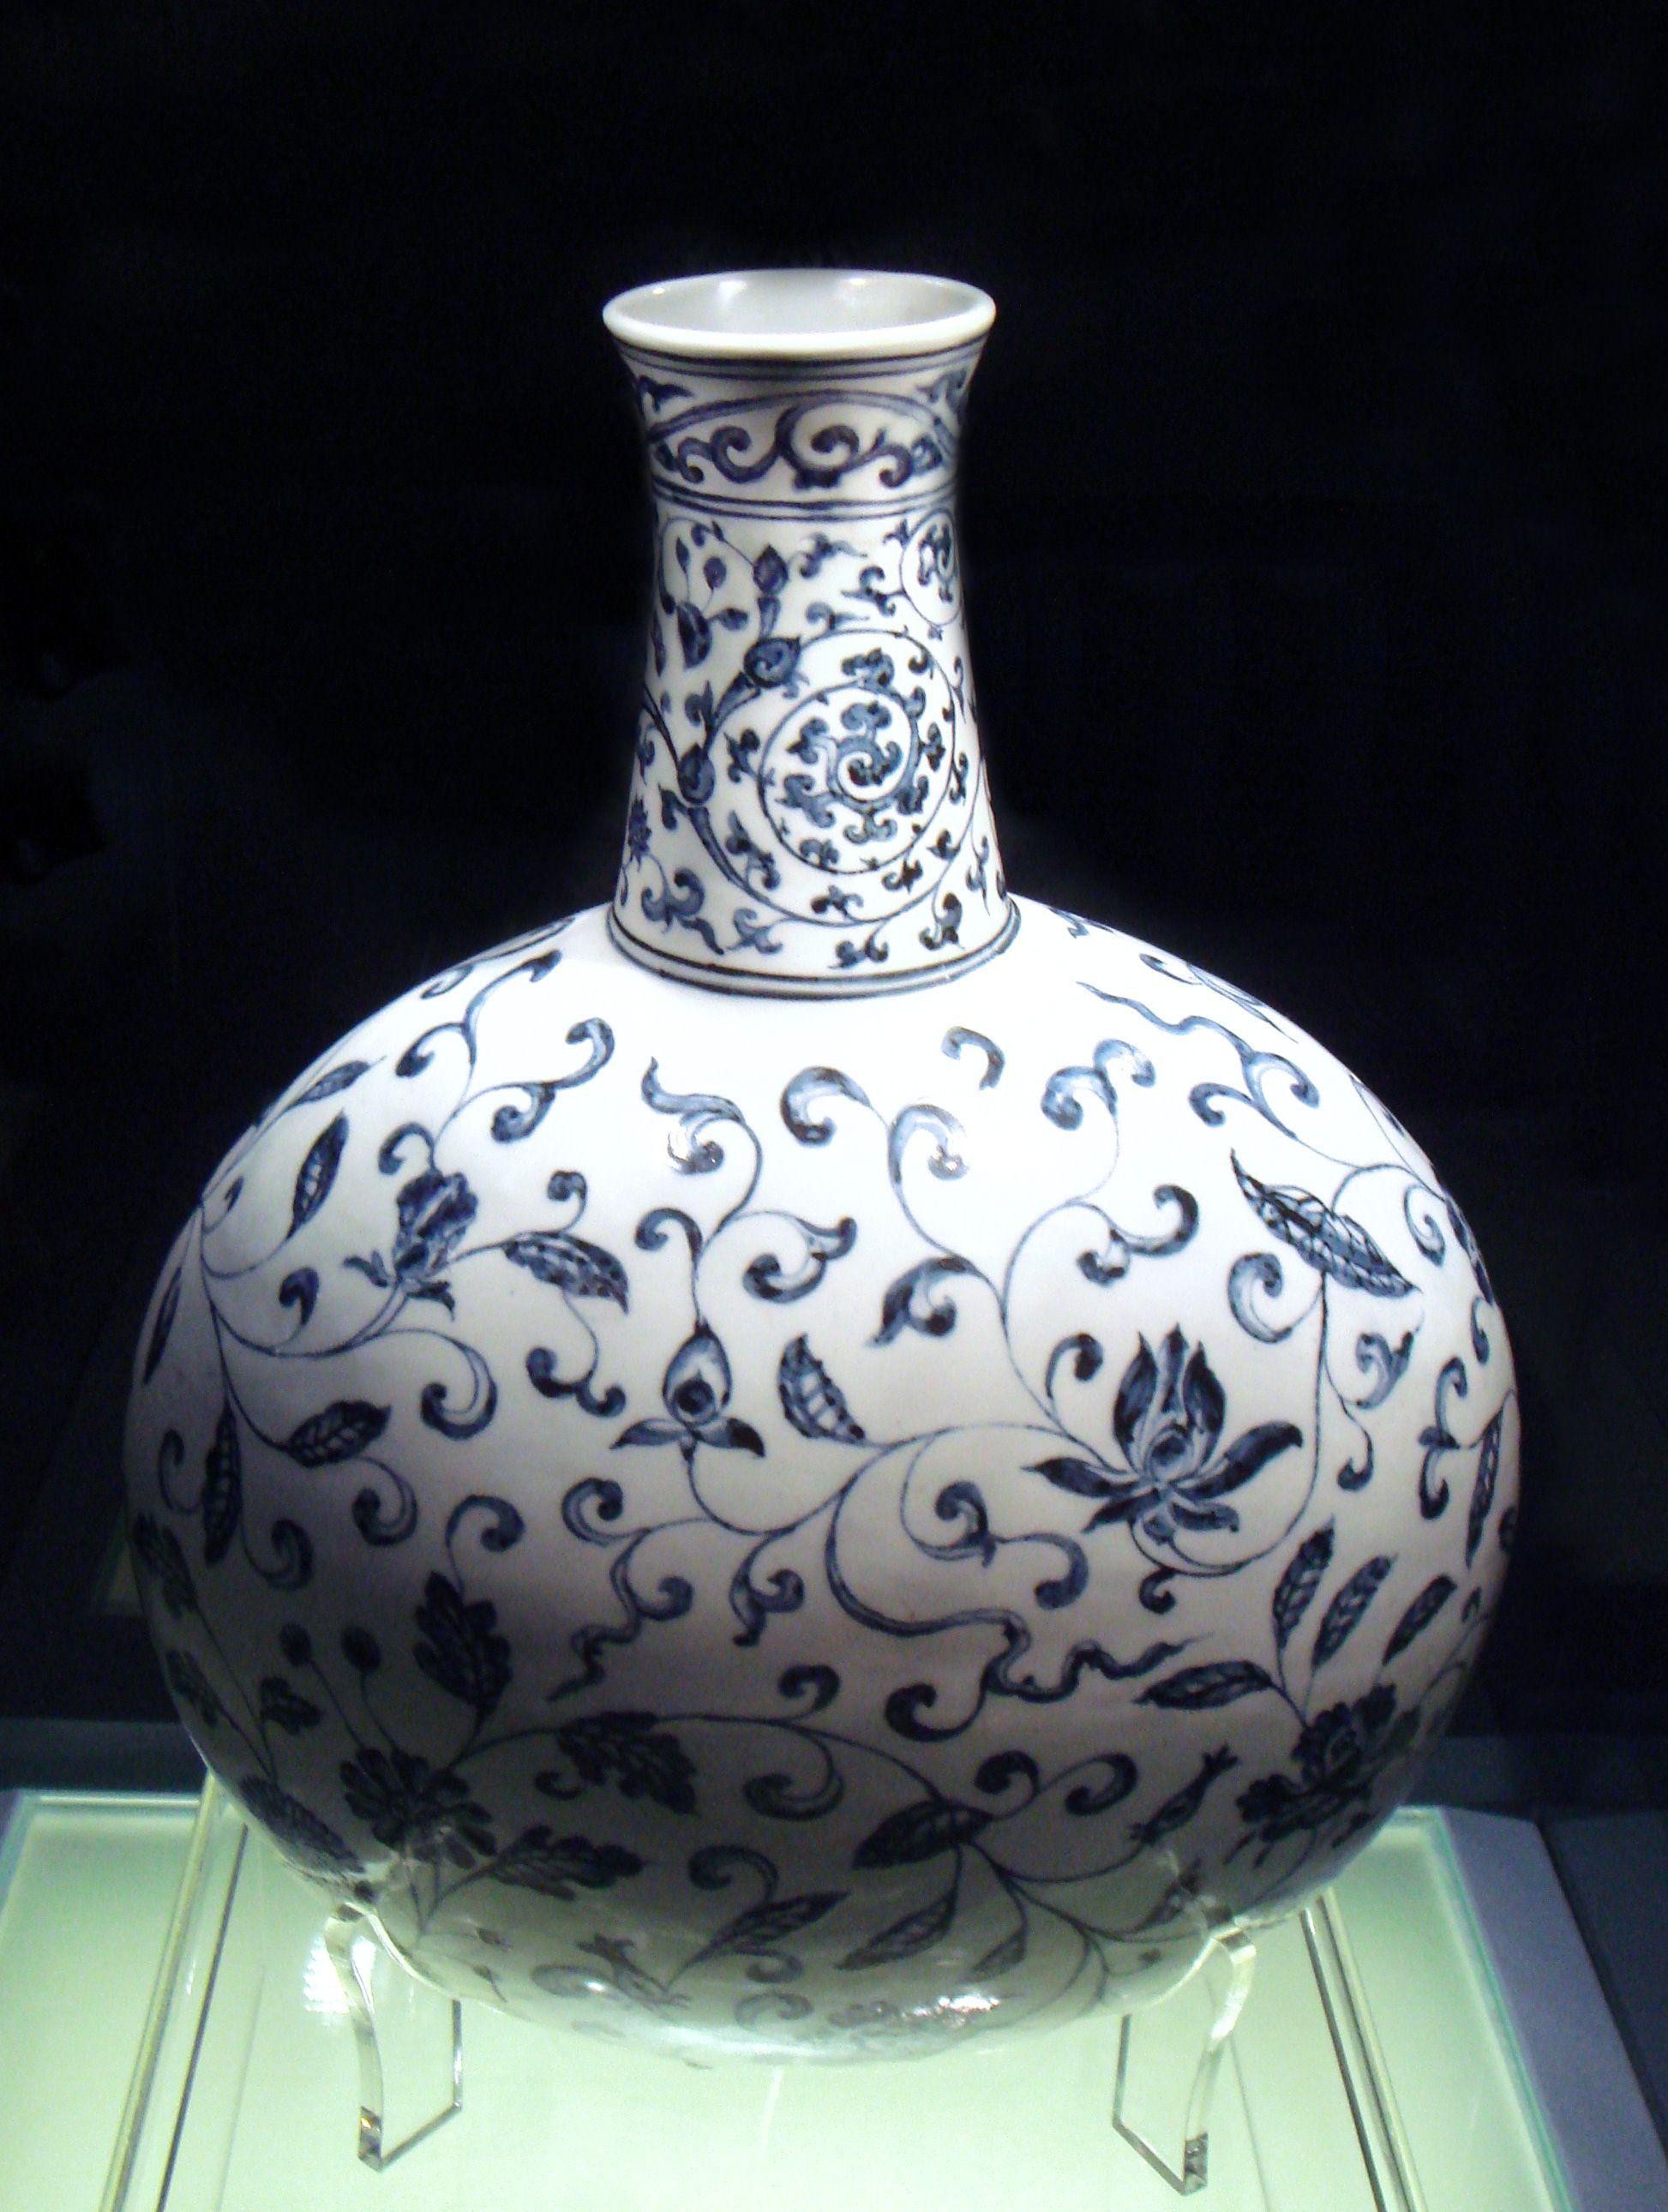 gold striped vase of blue and white ceramic vase inspirational file blue and white vase within blue and white ceramic vase inspirational file blue and white vase jingdezhen ming yongle 1403 1424